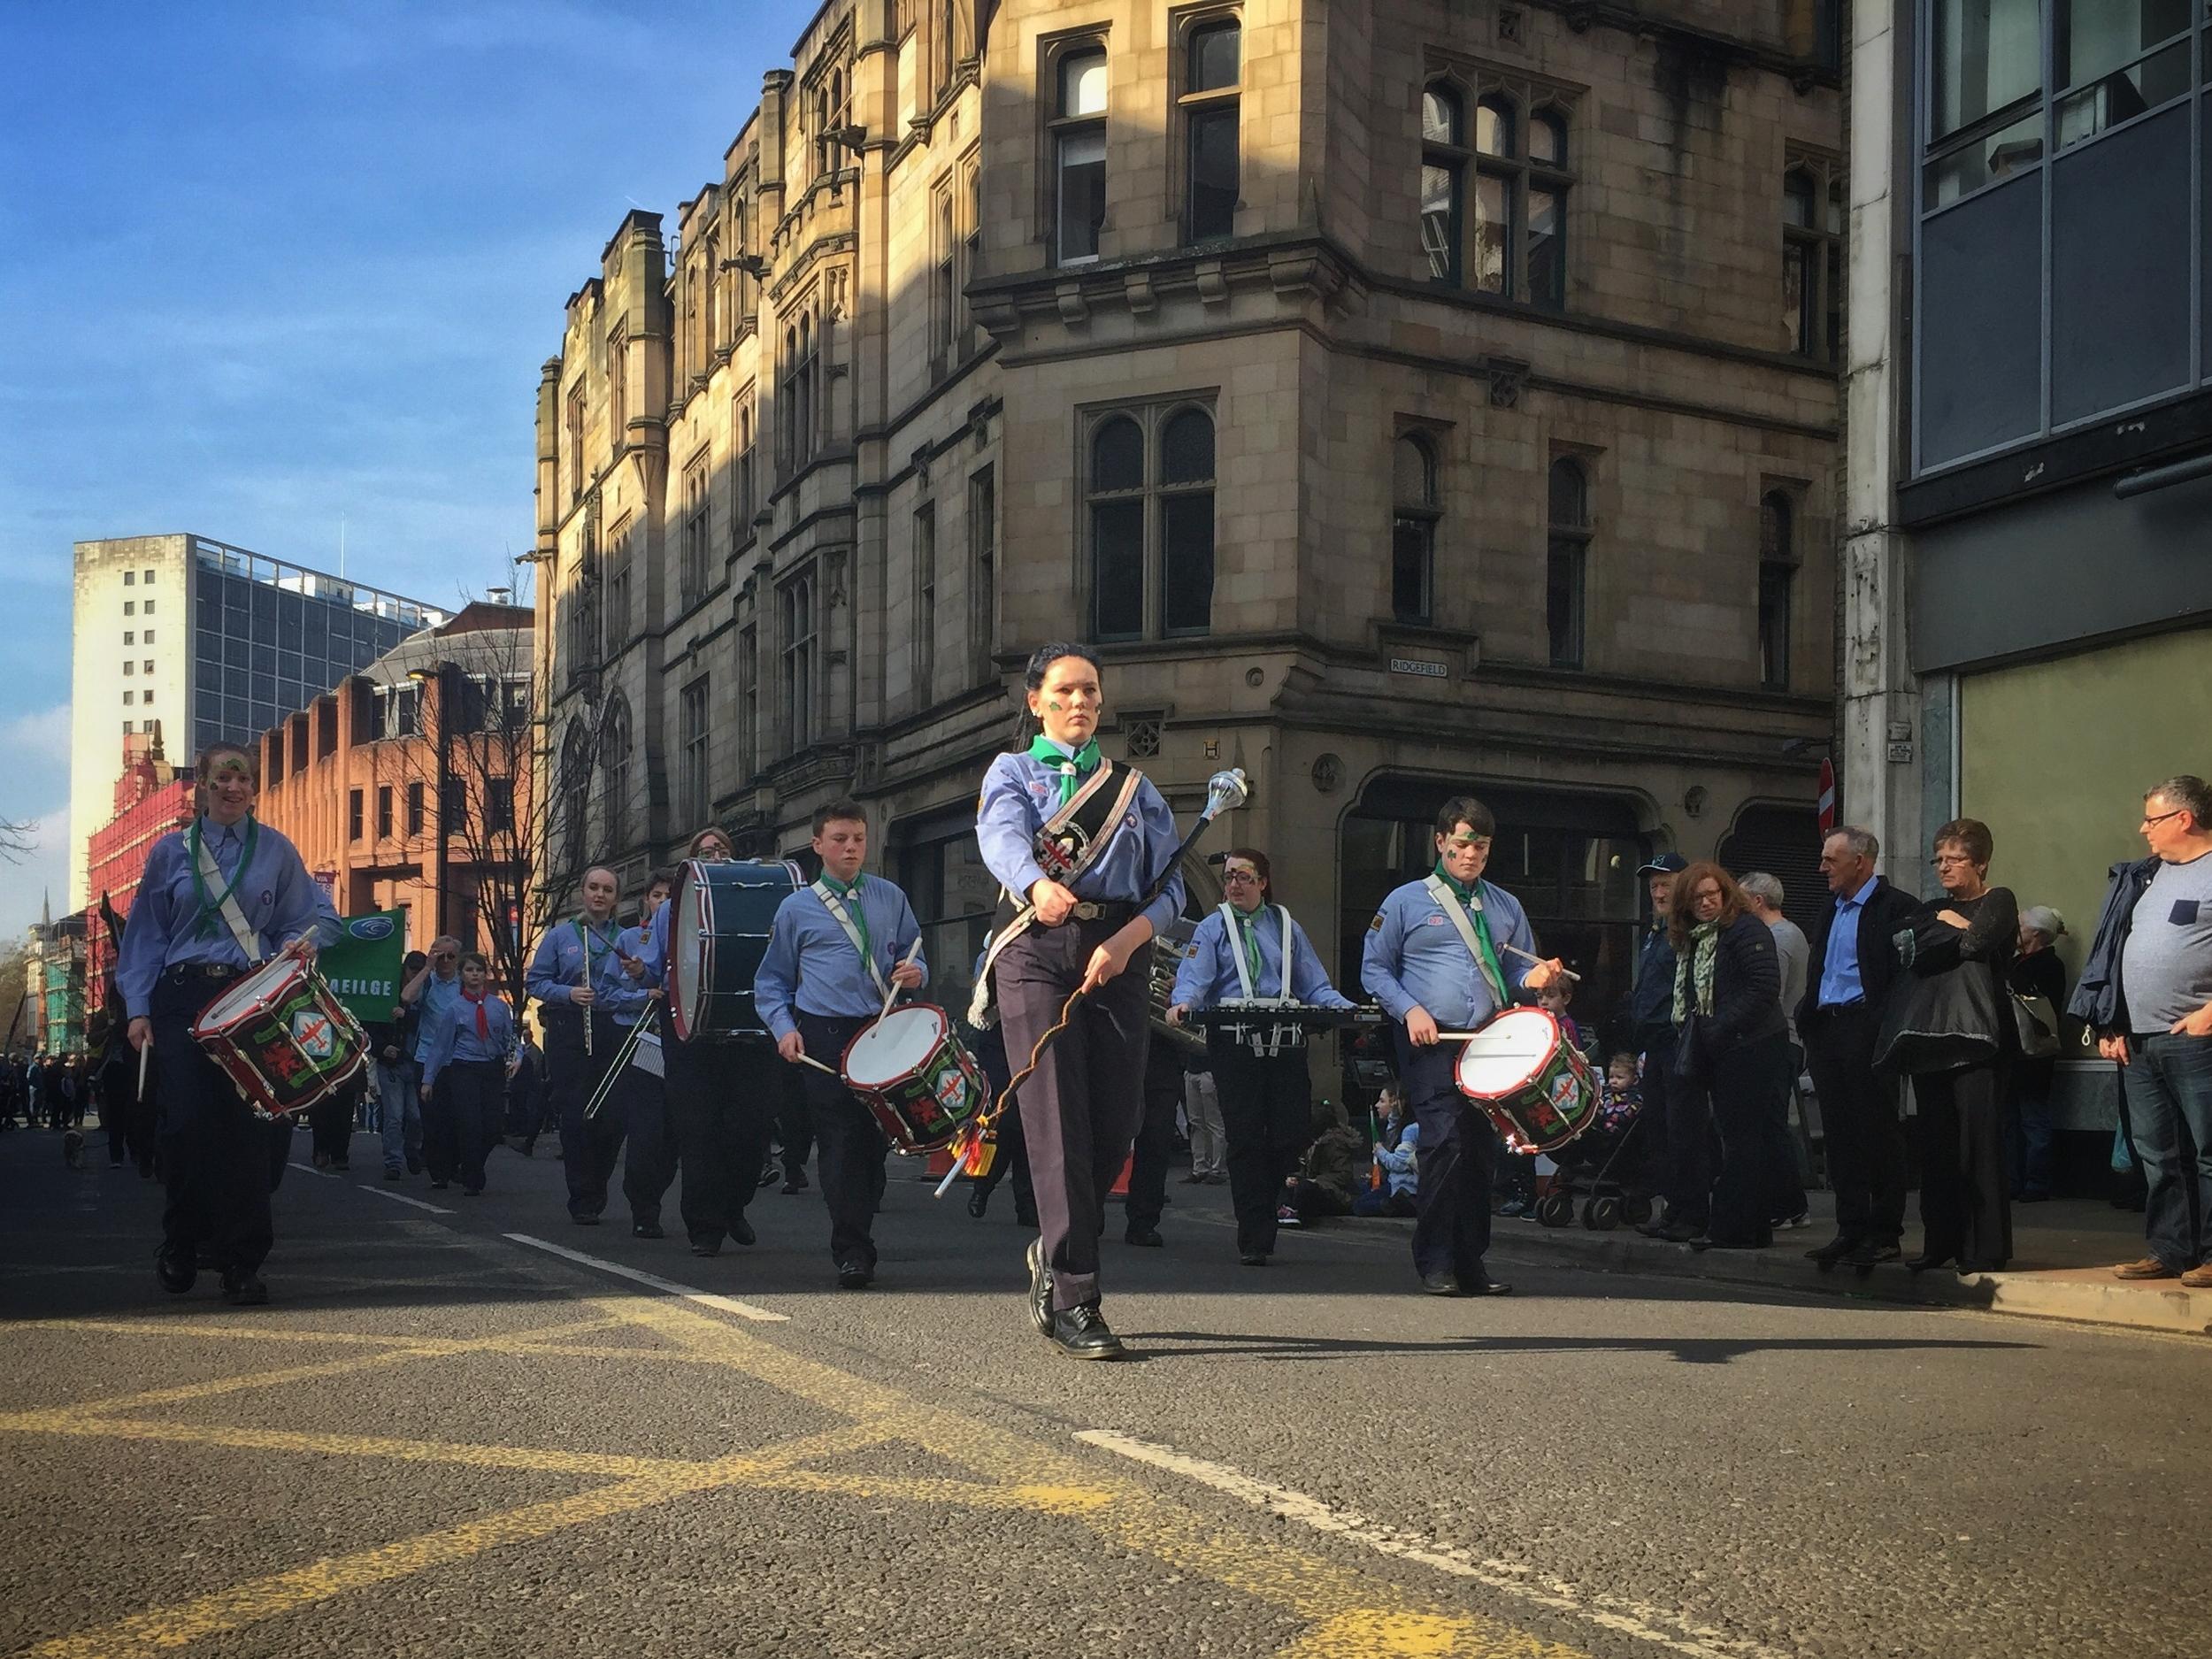 Manchester St Patricks parade